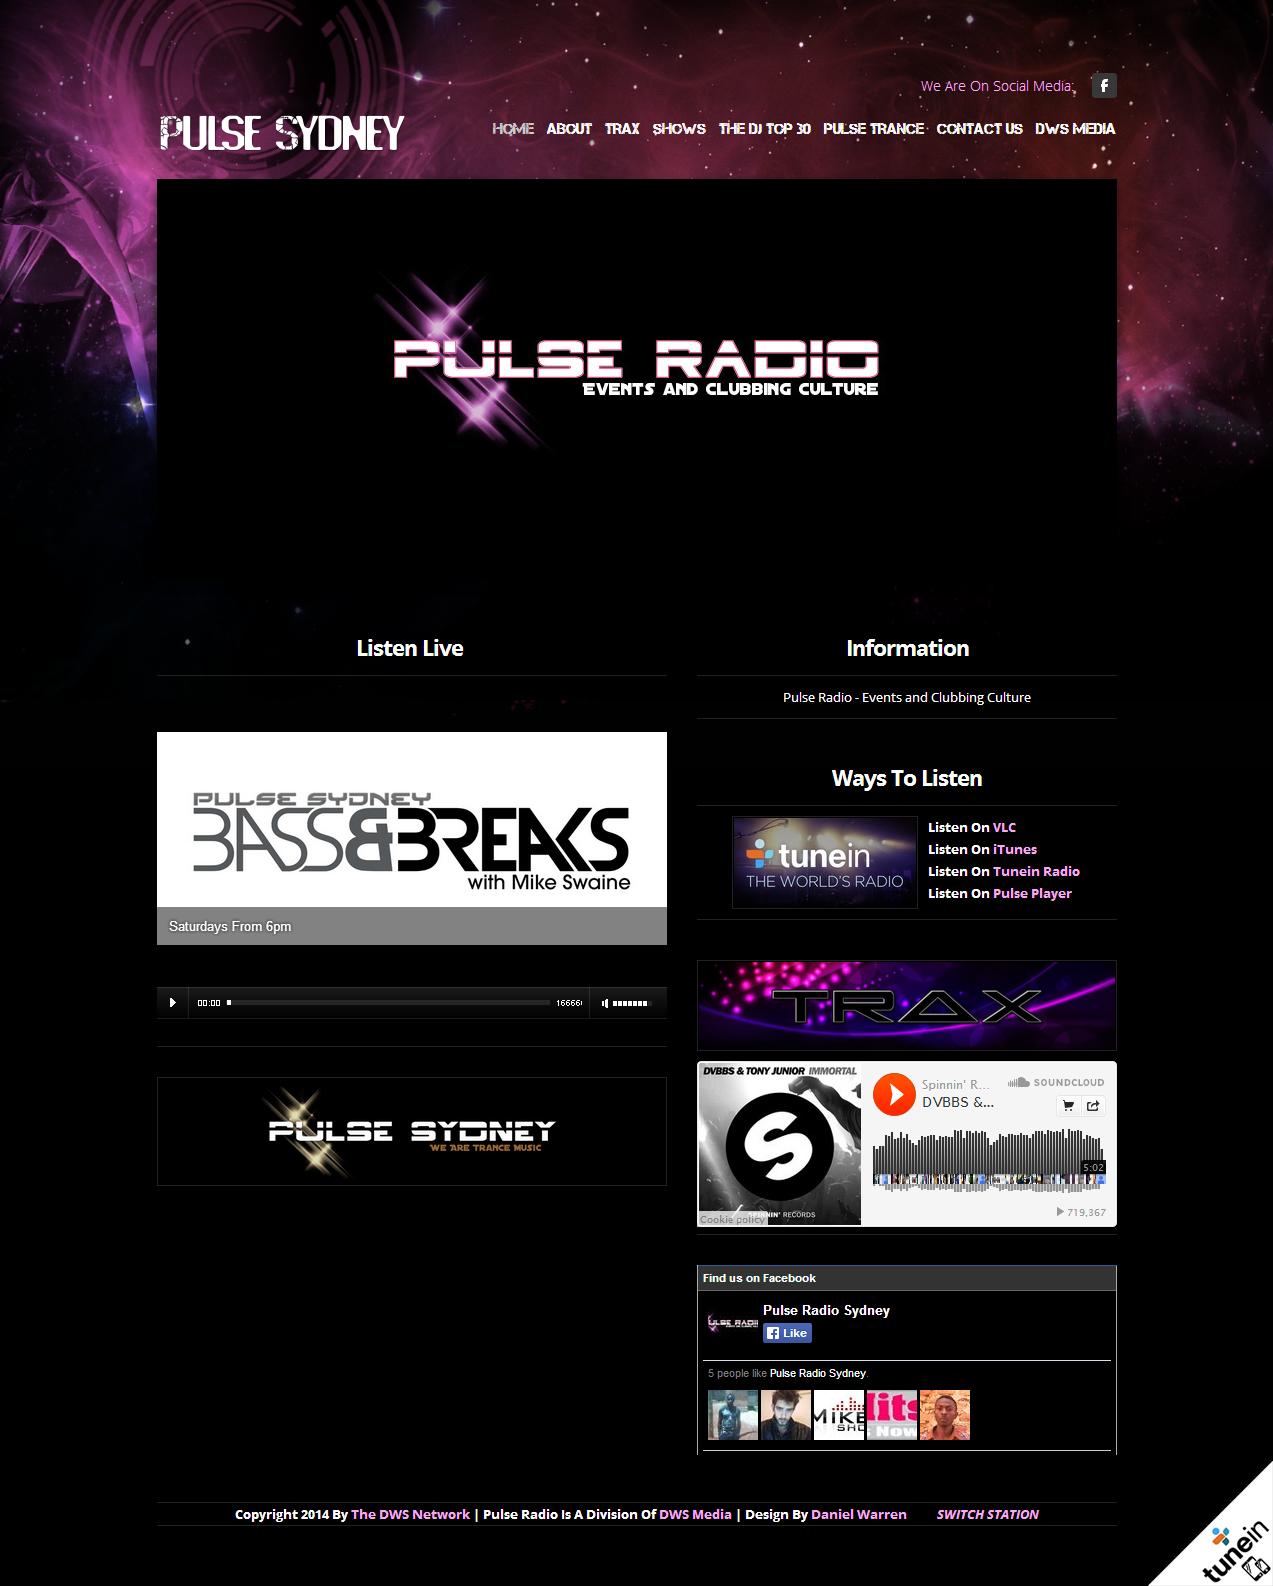 Pulse Radio late 2013 Theme - pulsesydney.com